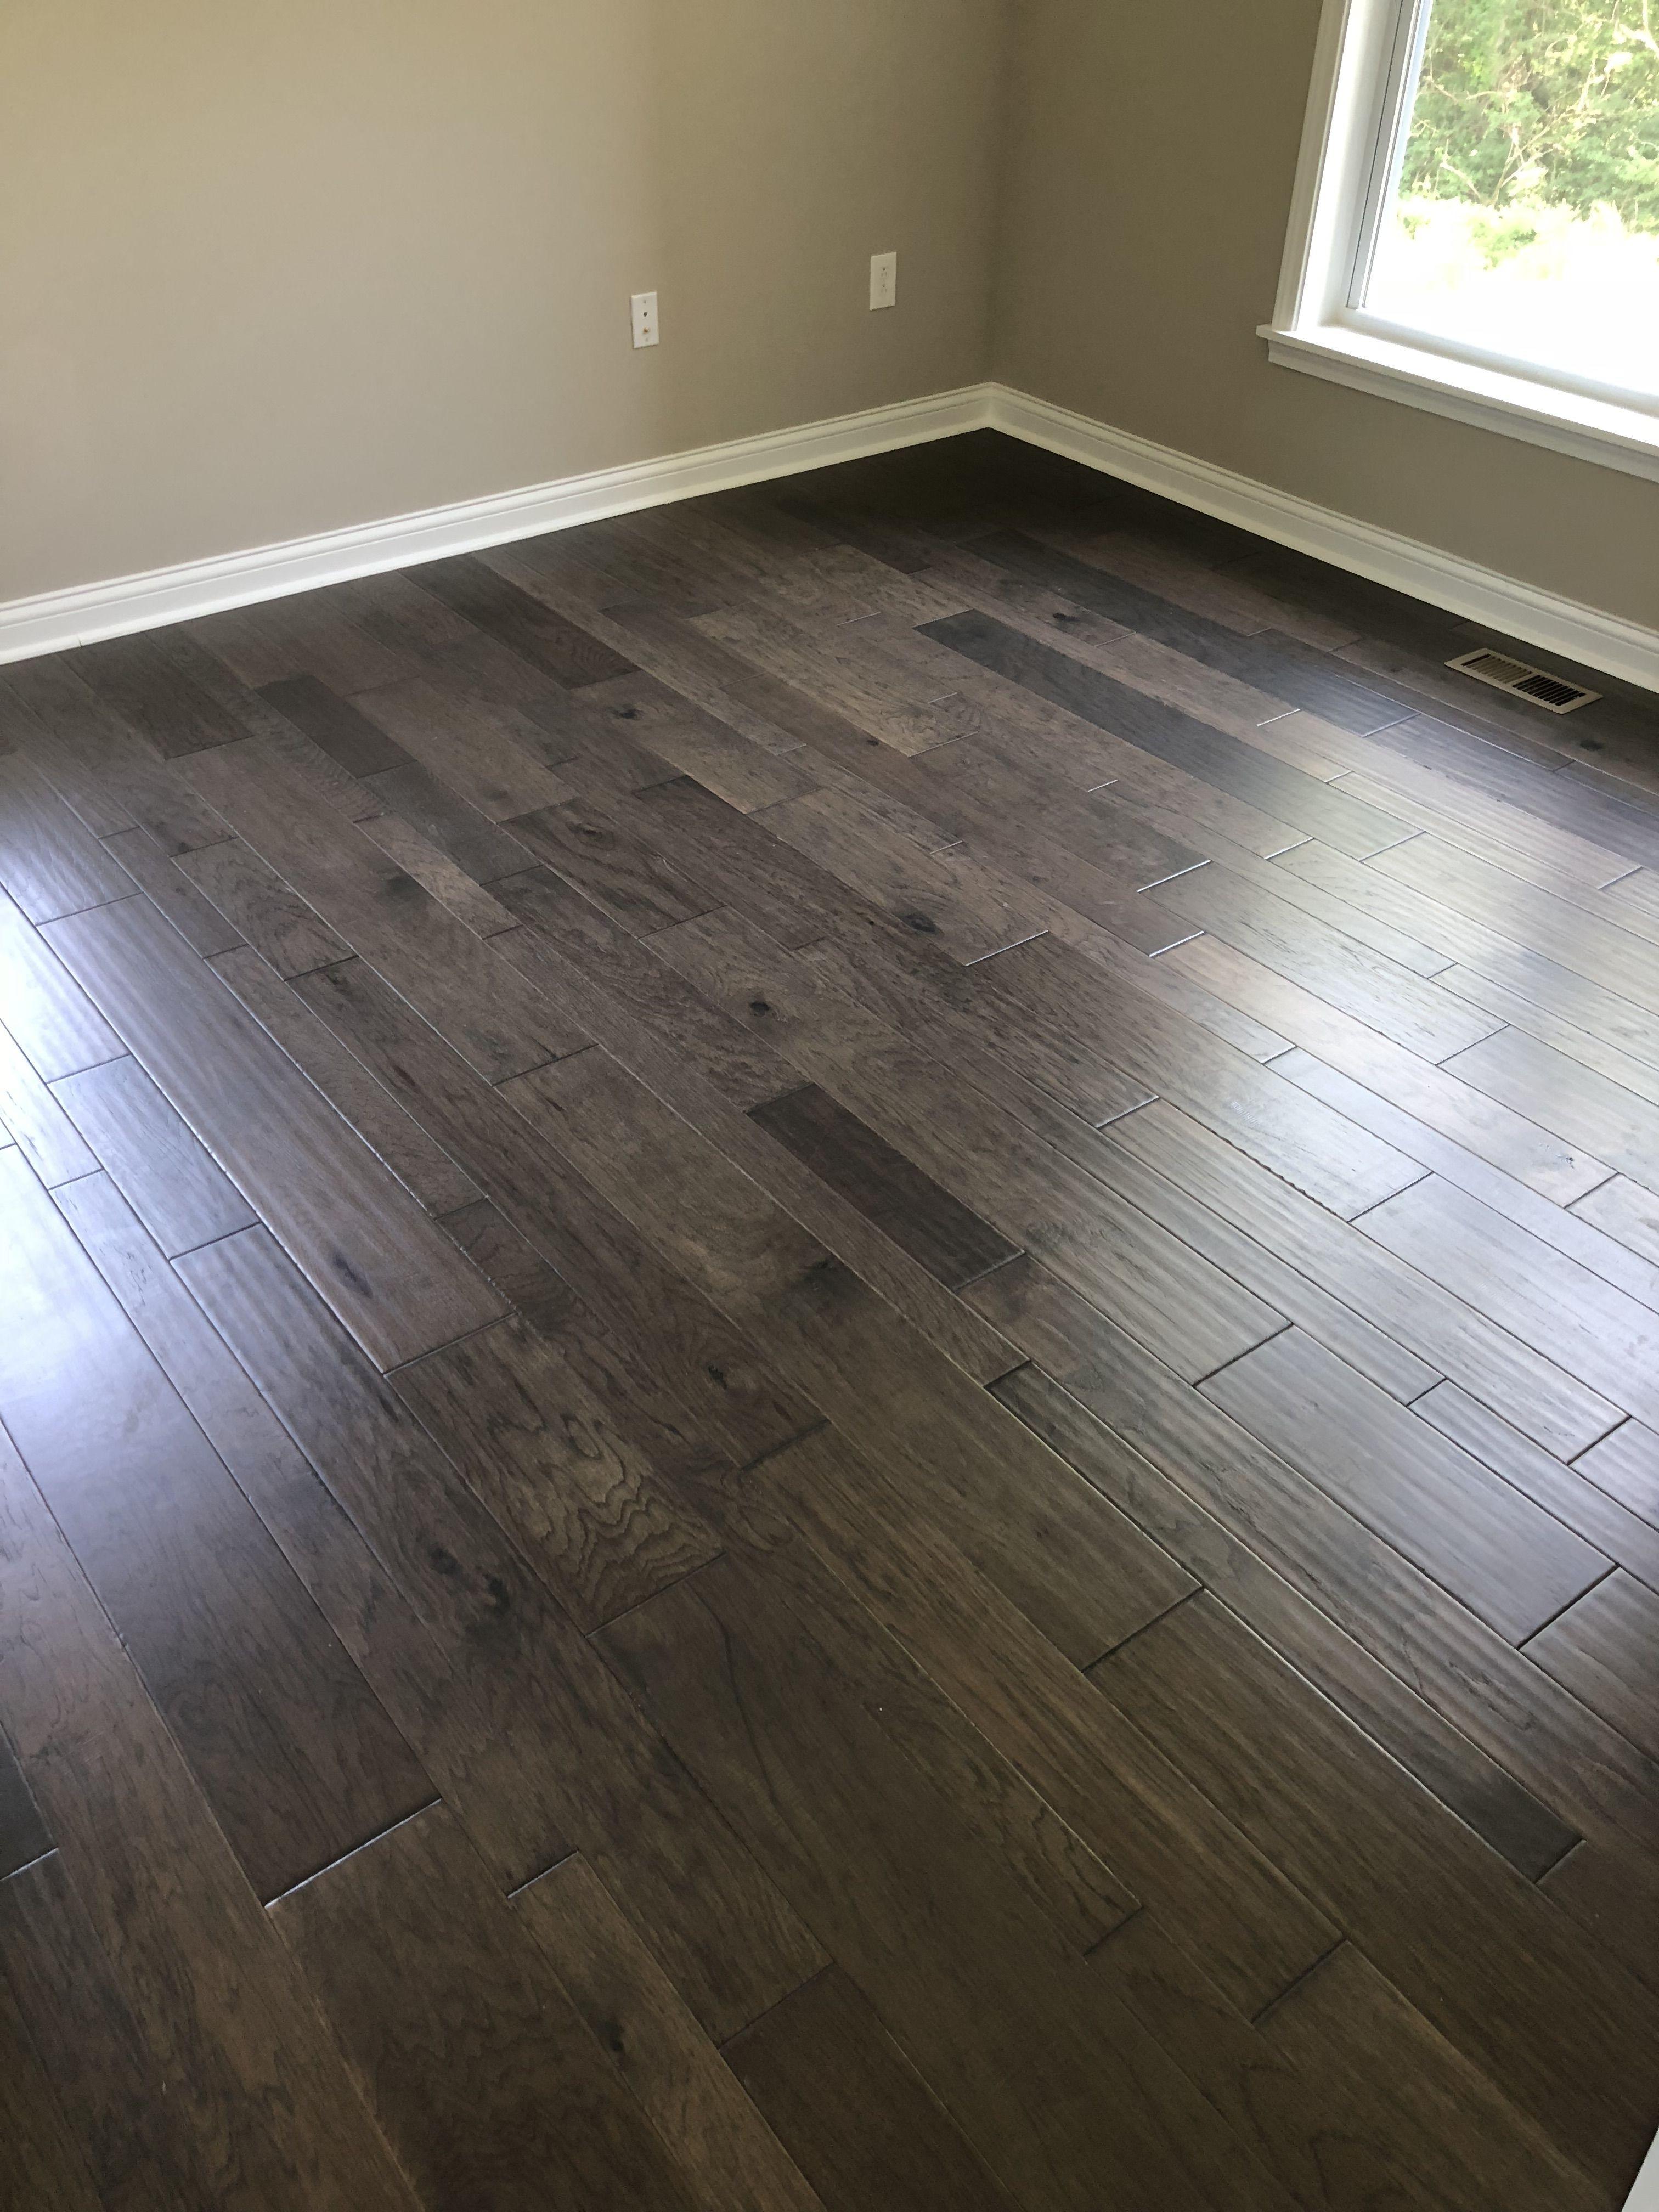 hickory hardwood flooring hardness of engineered hickory wood floors inspirational wood floor stain with regard to engineered hickory wood floors fresh glenford hickory anchor hickory engineered hardwood floors